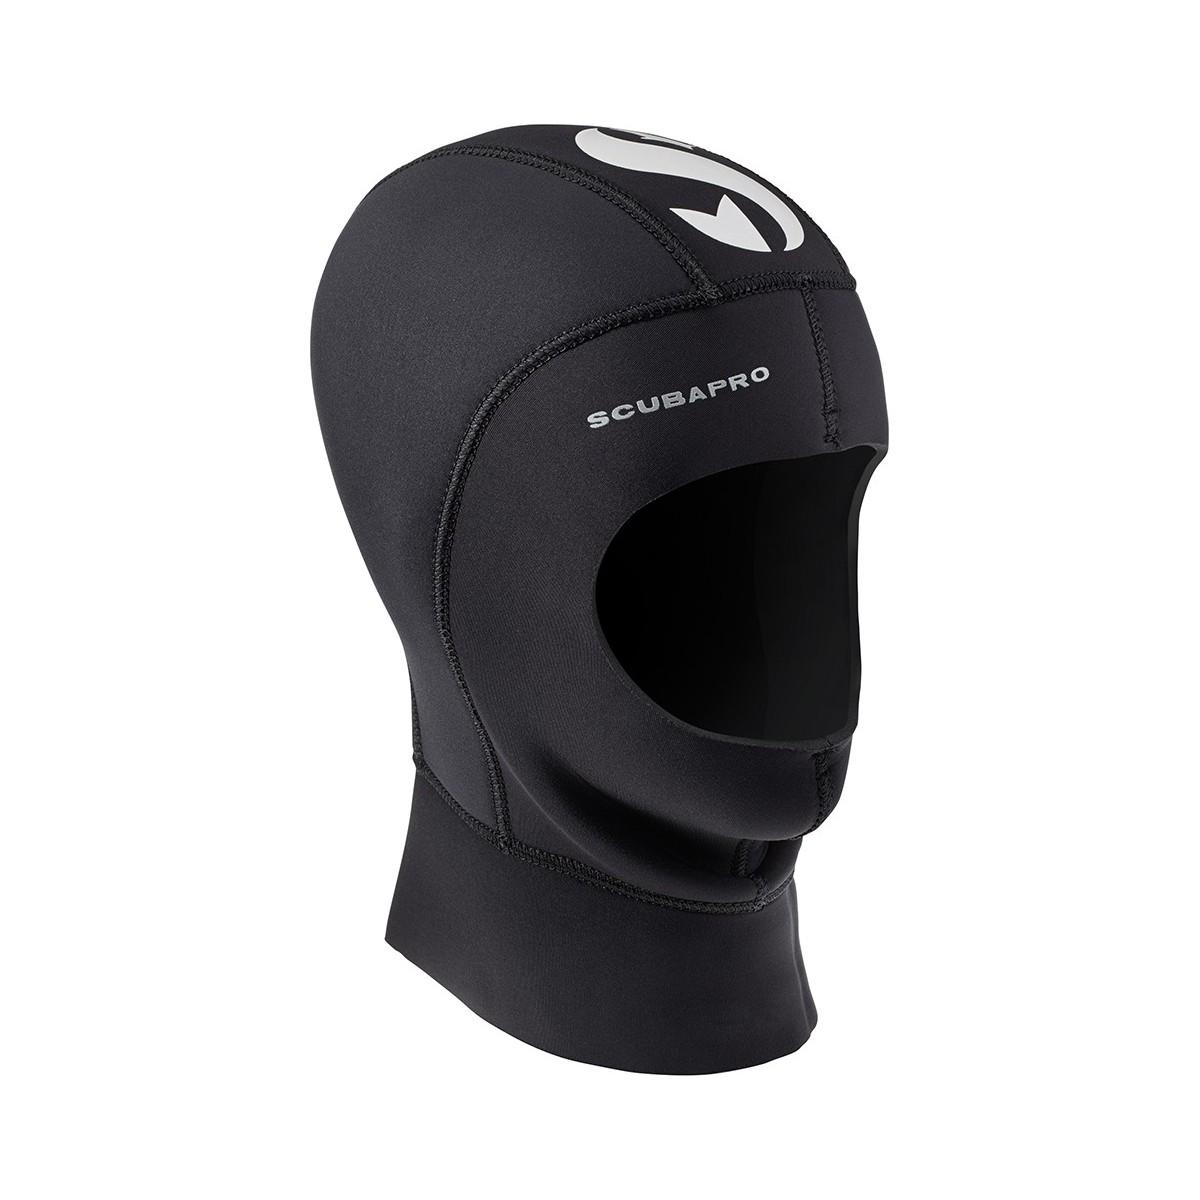 Scubapro Everflex Hood 5/3mm and 3/2mm